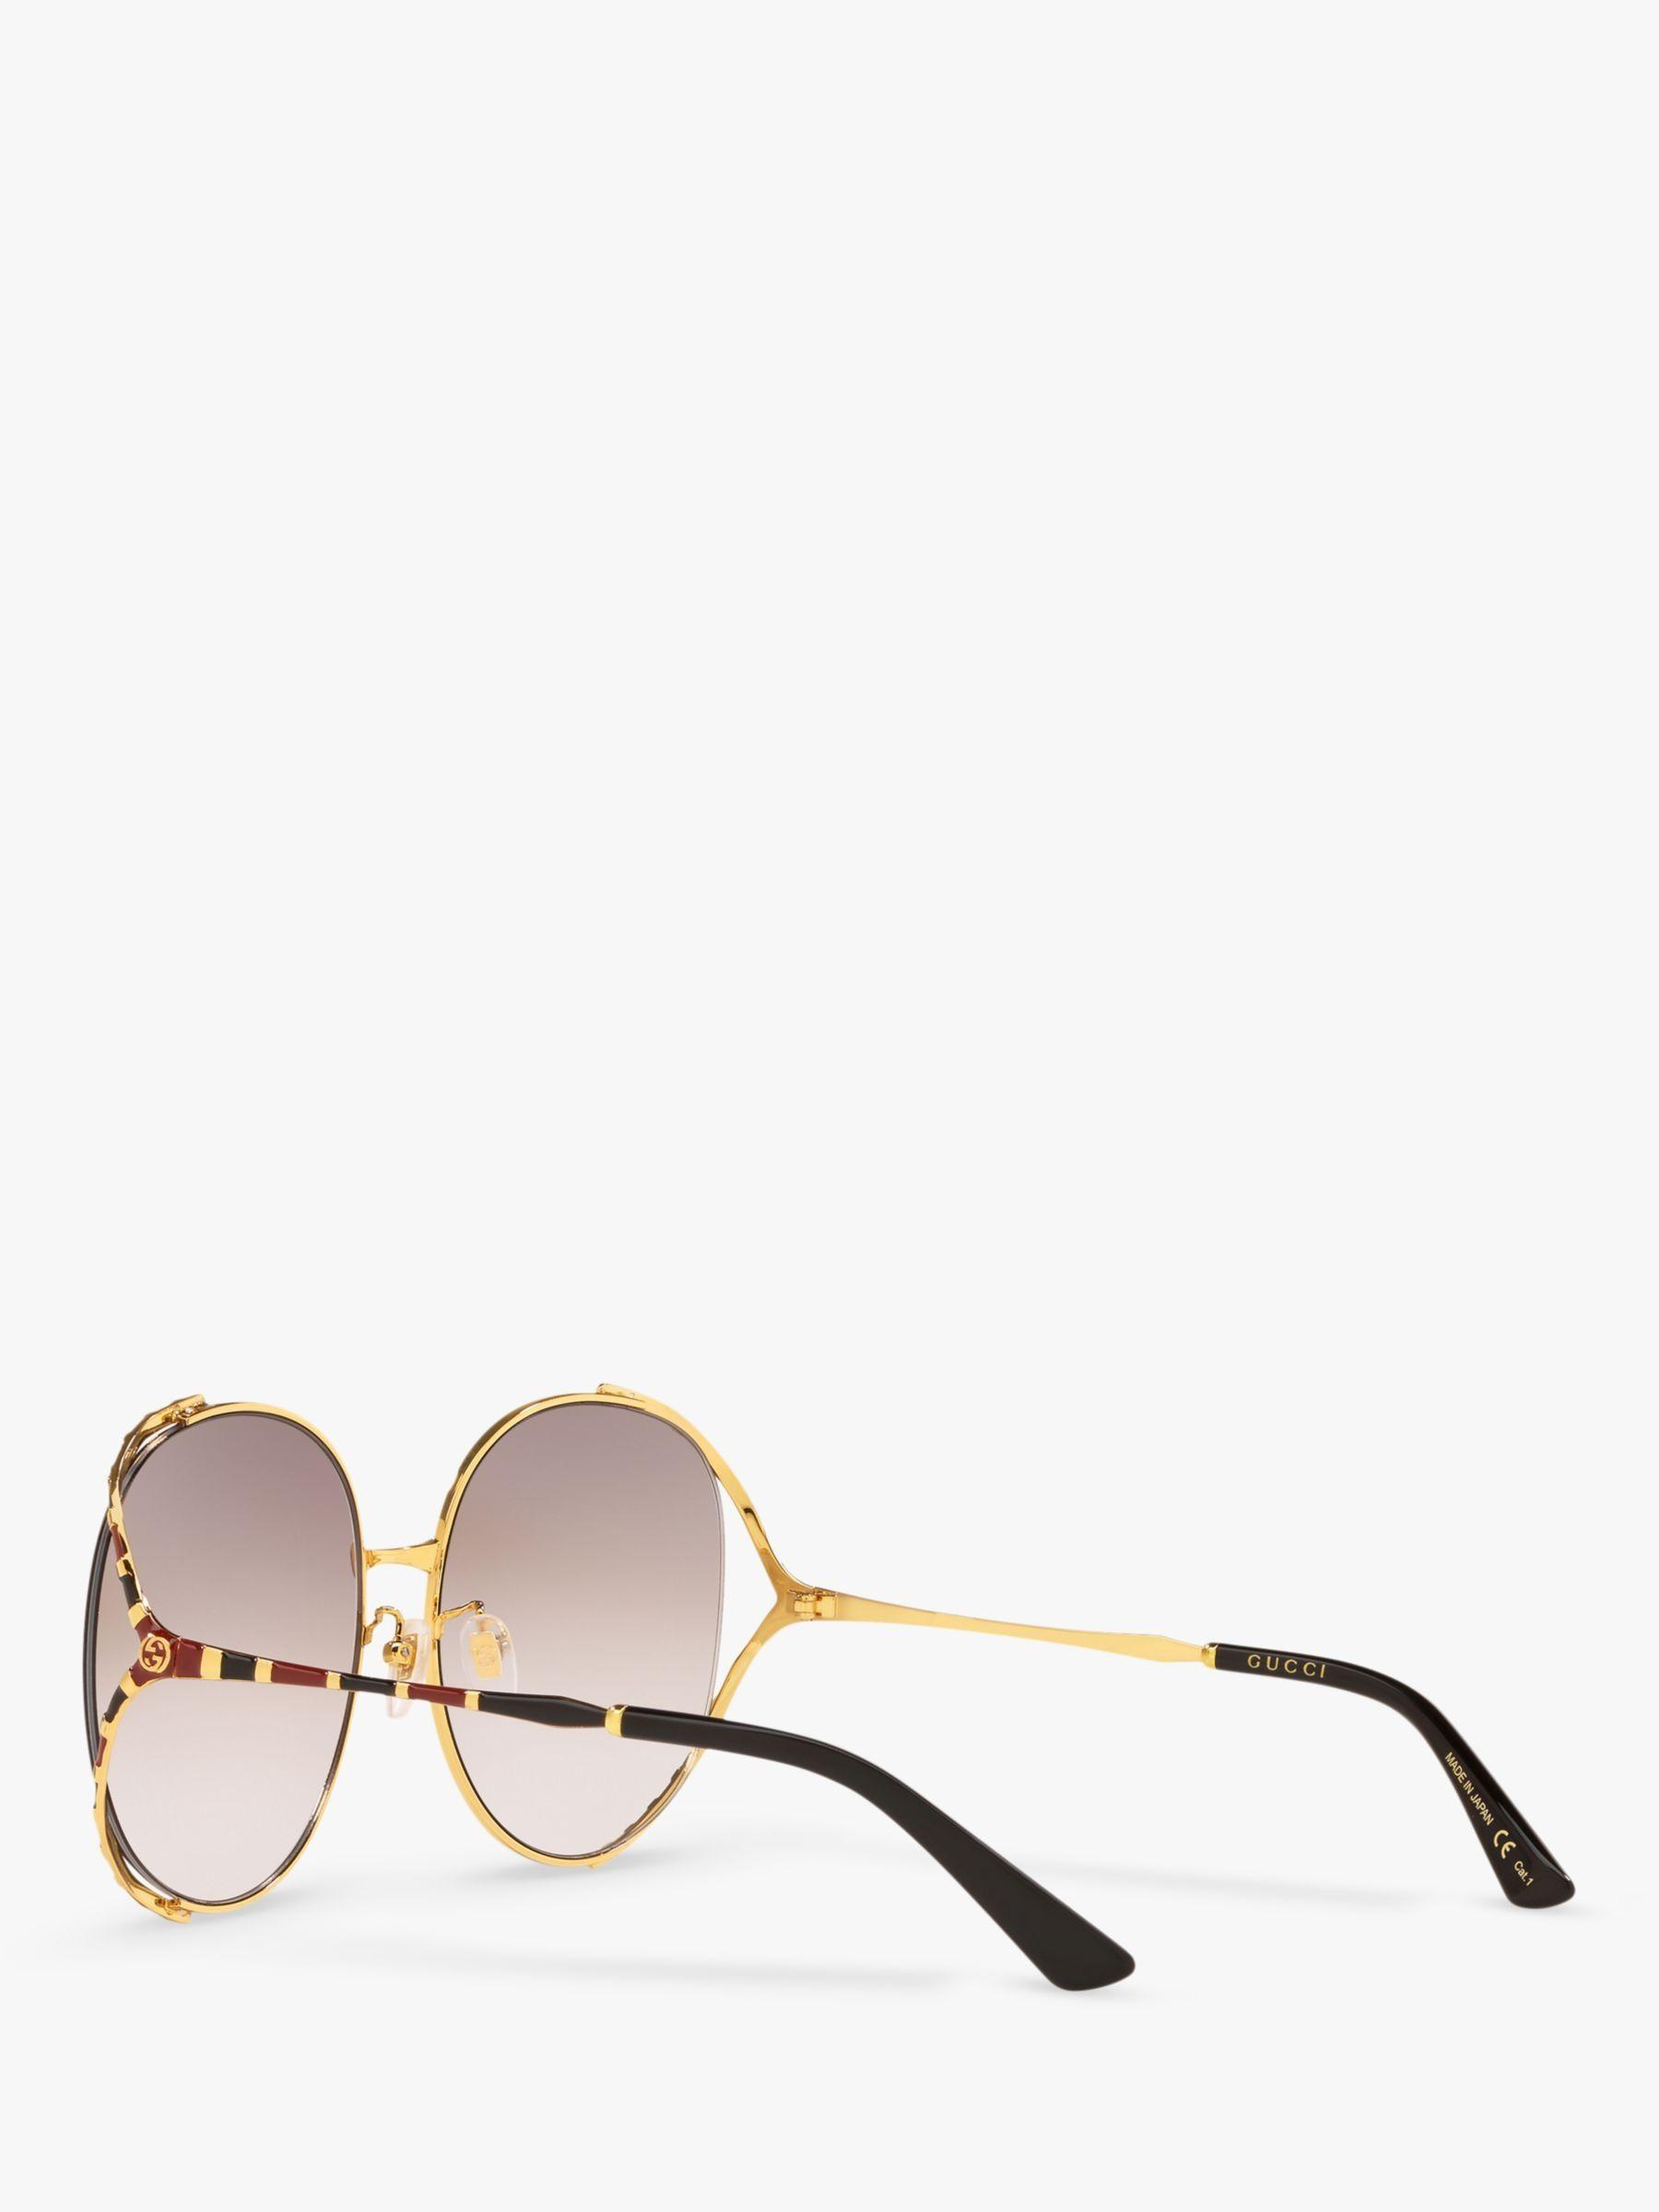 Gucci GG0595S Women's Oversized Oval Sunglasses, Gold/Beige Gradient